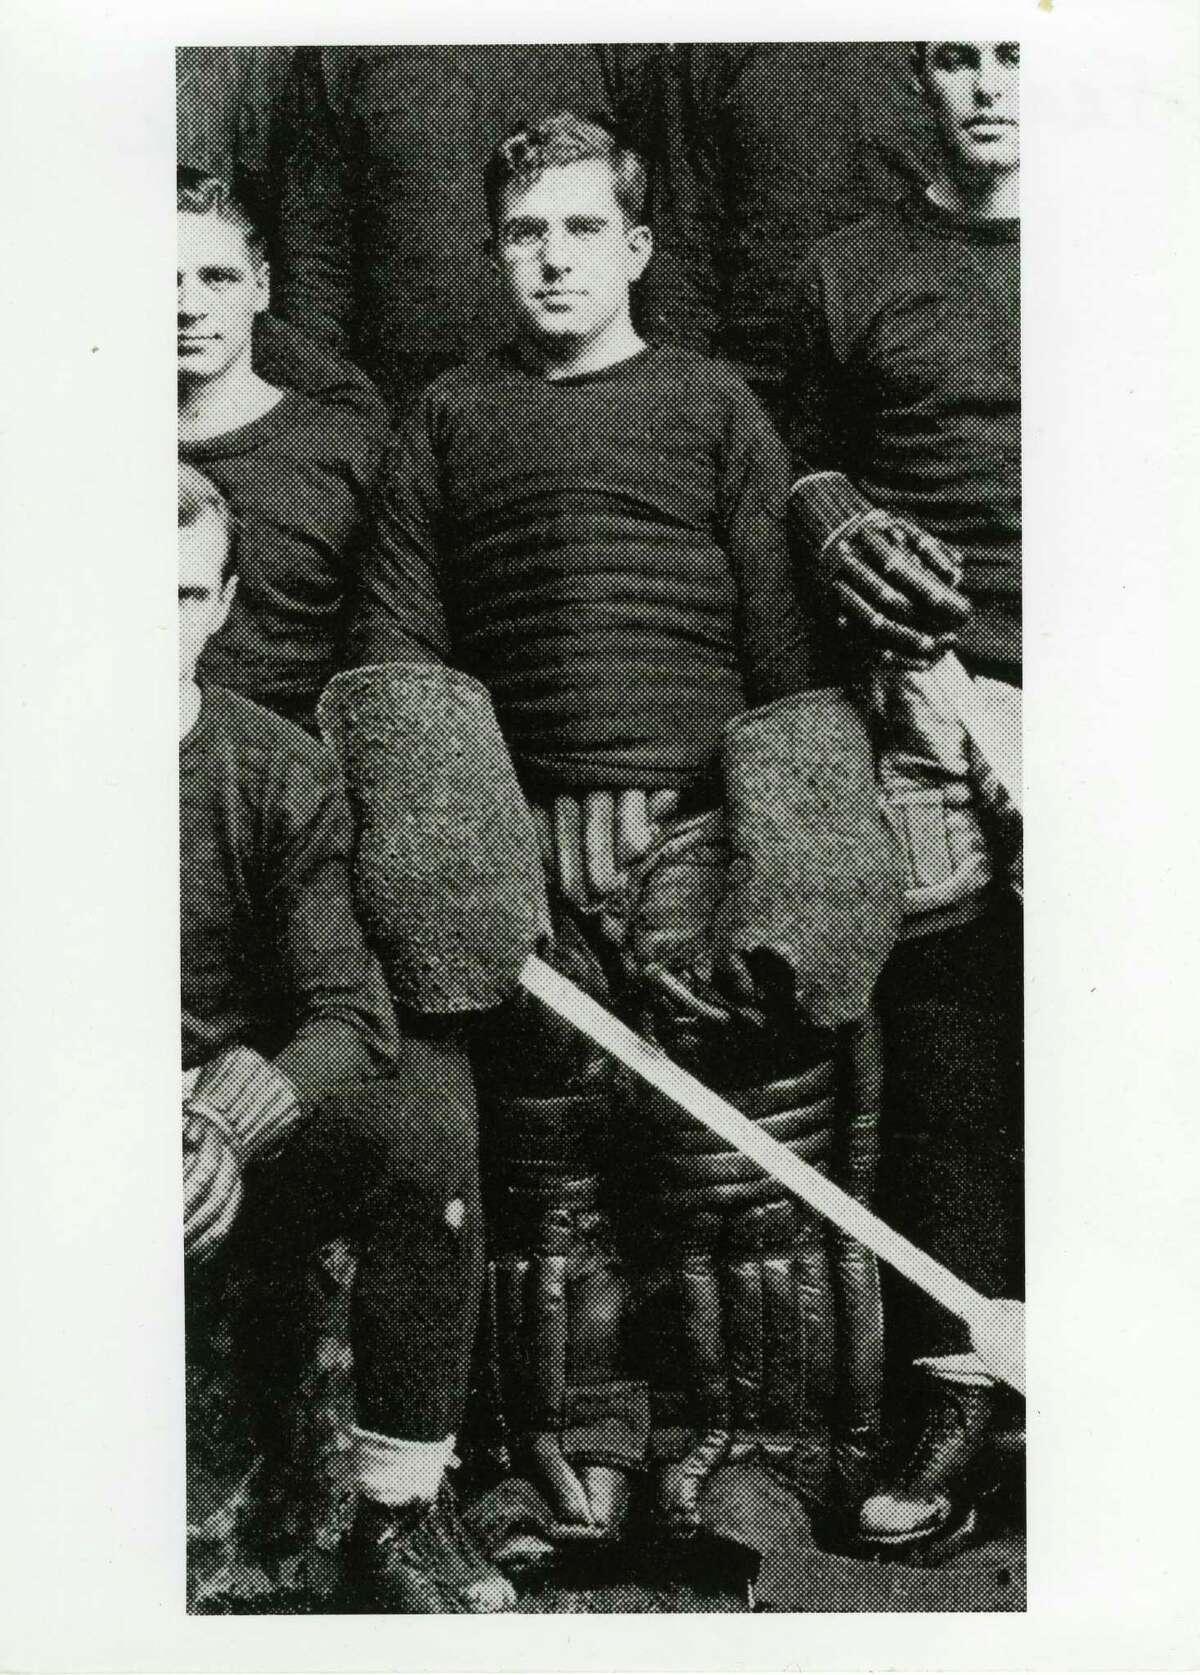 Franklin 'Tot' Farrel (Photo courtesy of Yale Athletics)